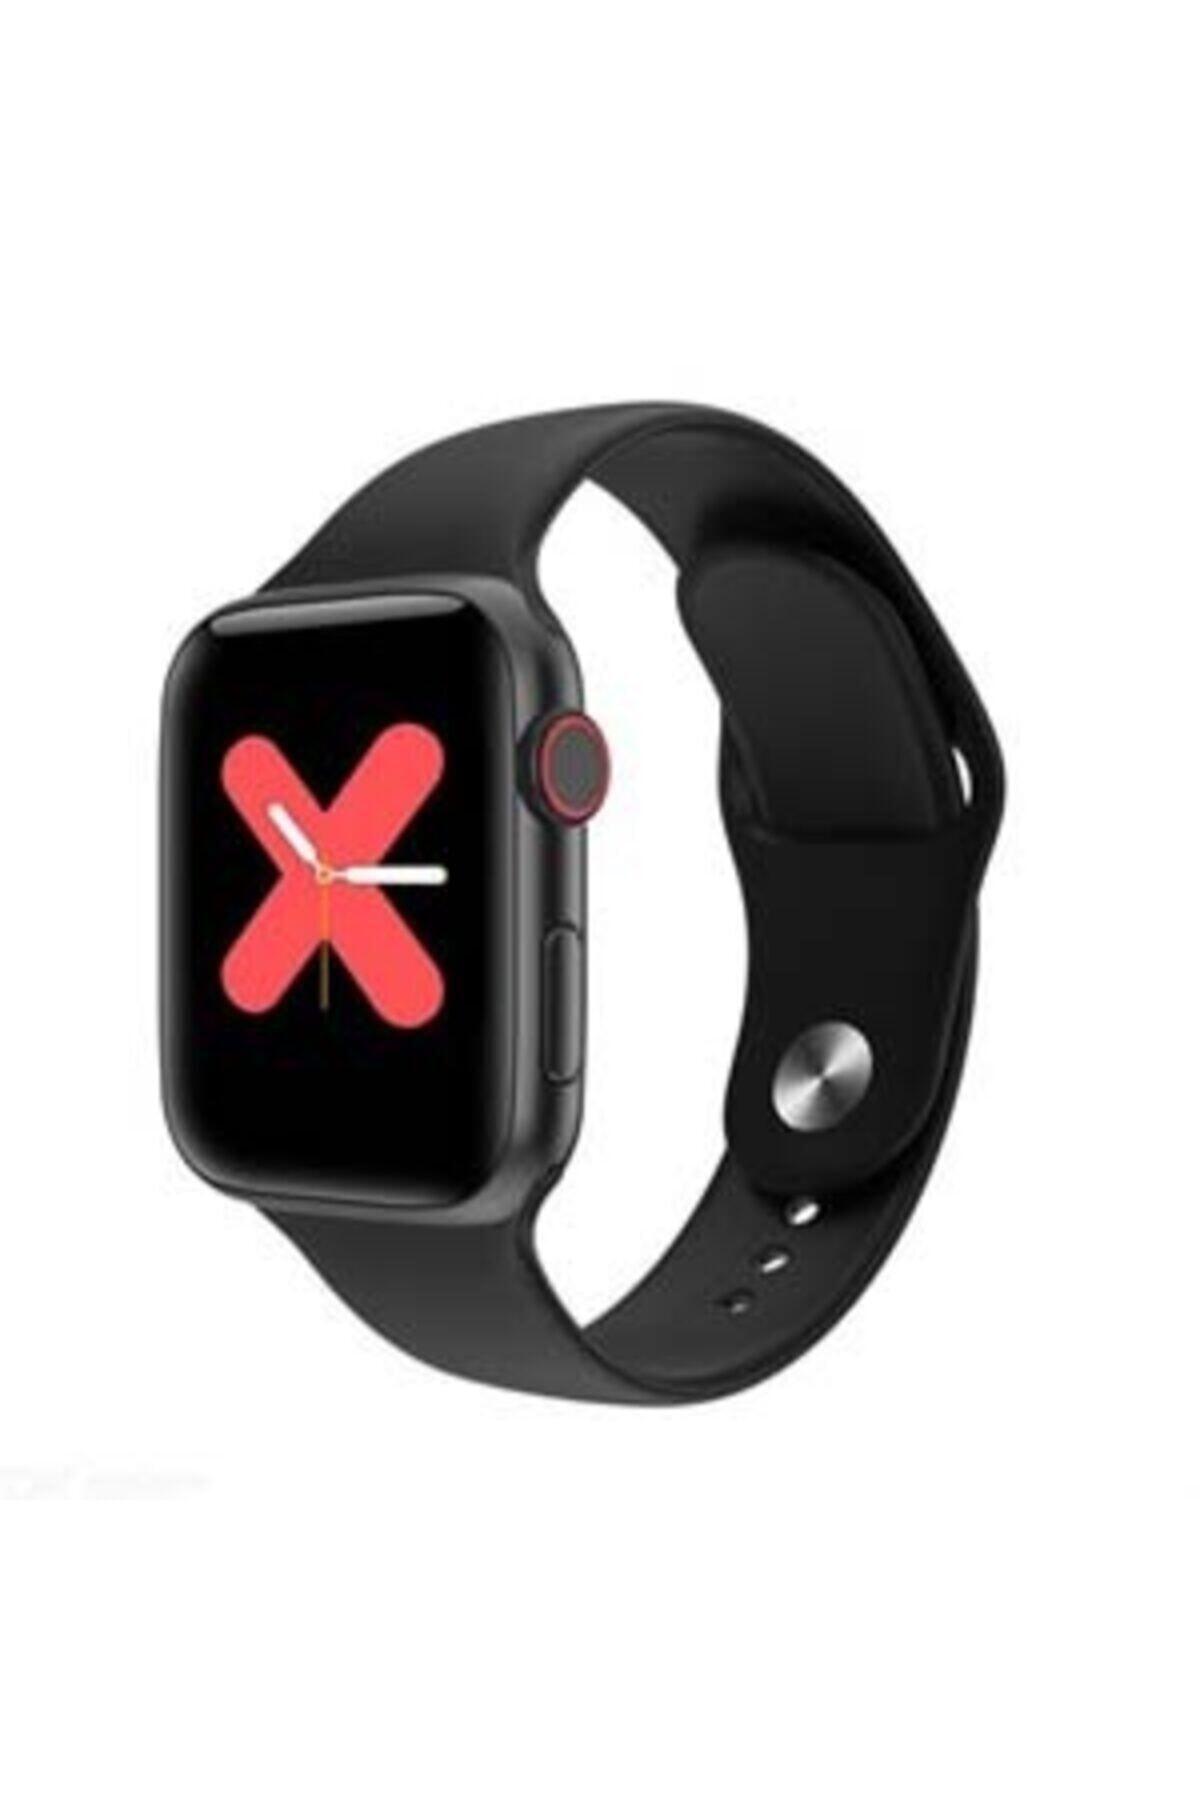 OWWOTECH T500 Akıllı Saat Smart Watch Türkçe Arama Cevaplama Sporcu Saati 2